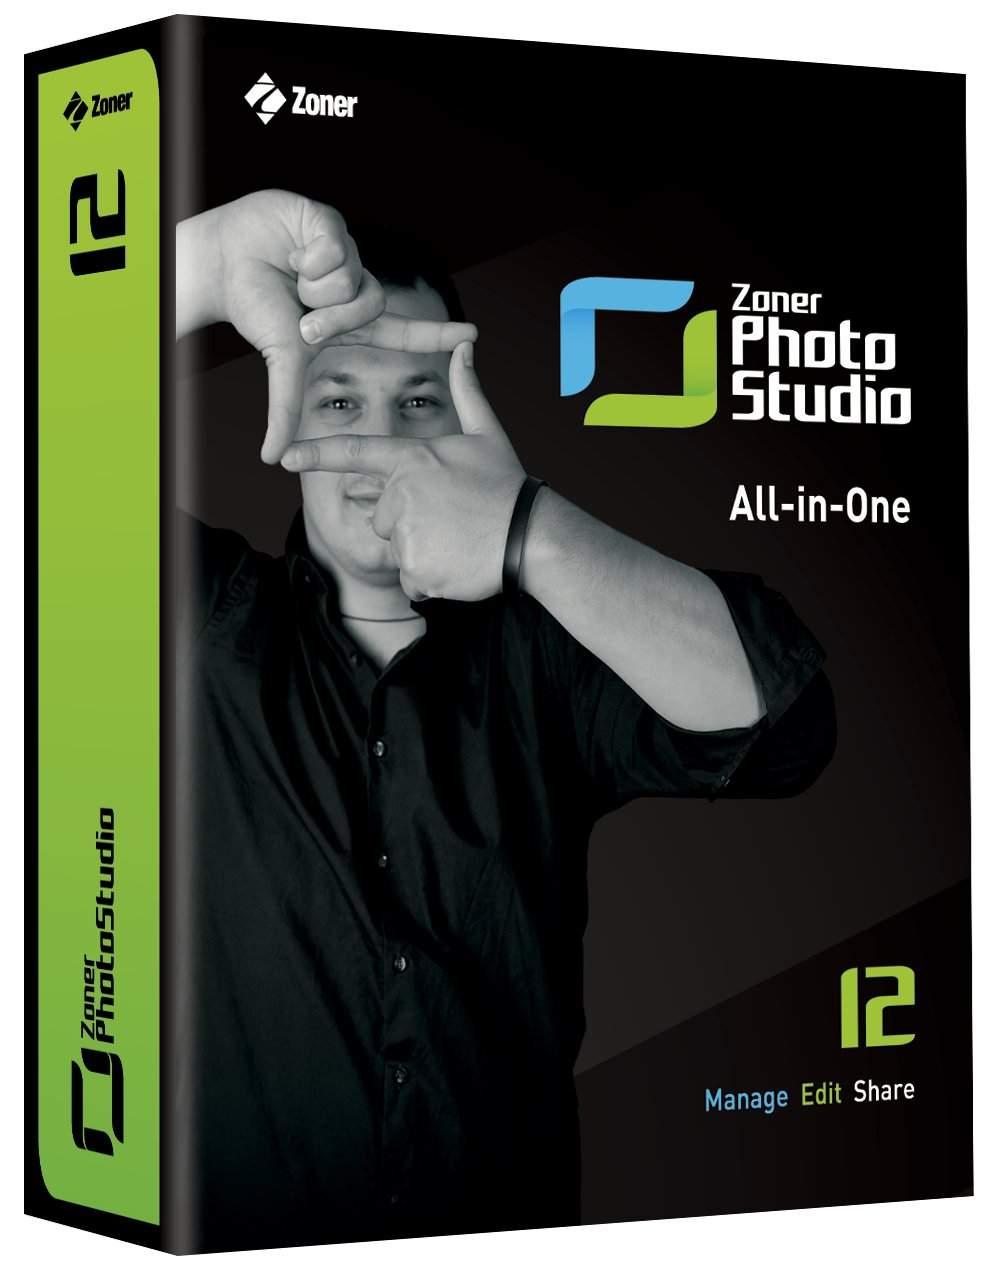 Zoner Photo Studio 超值搶手下殺五折